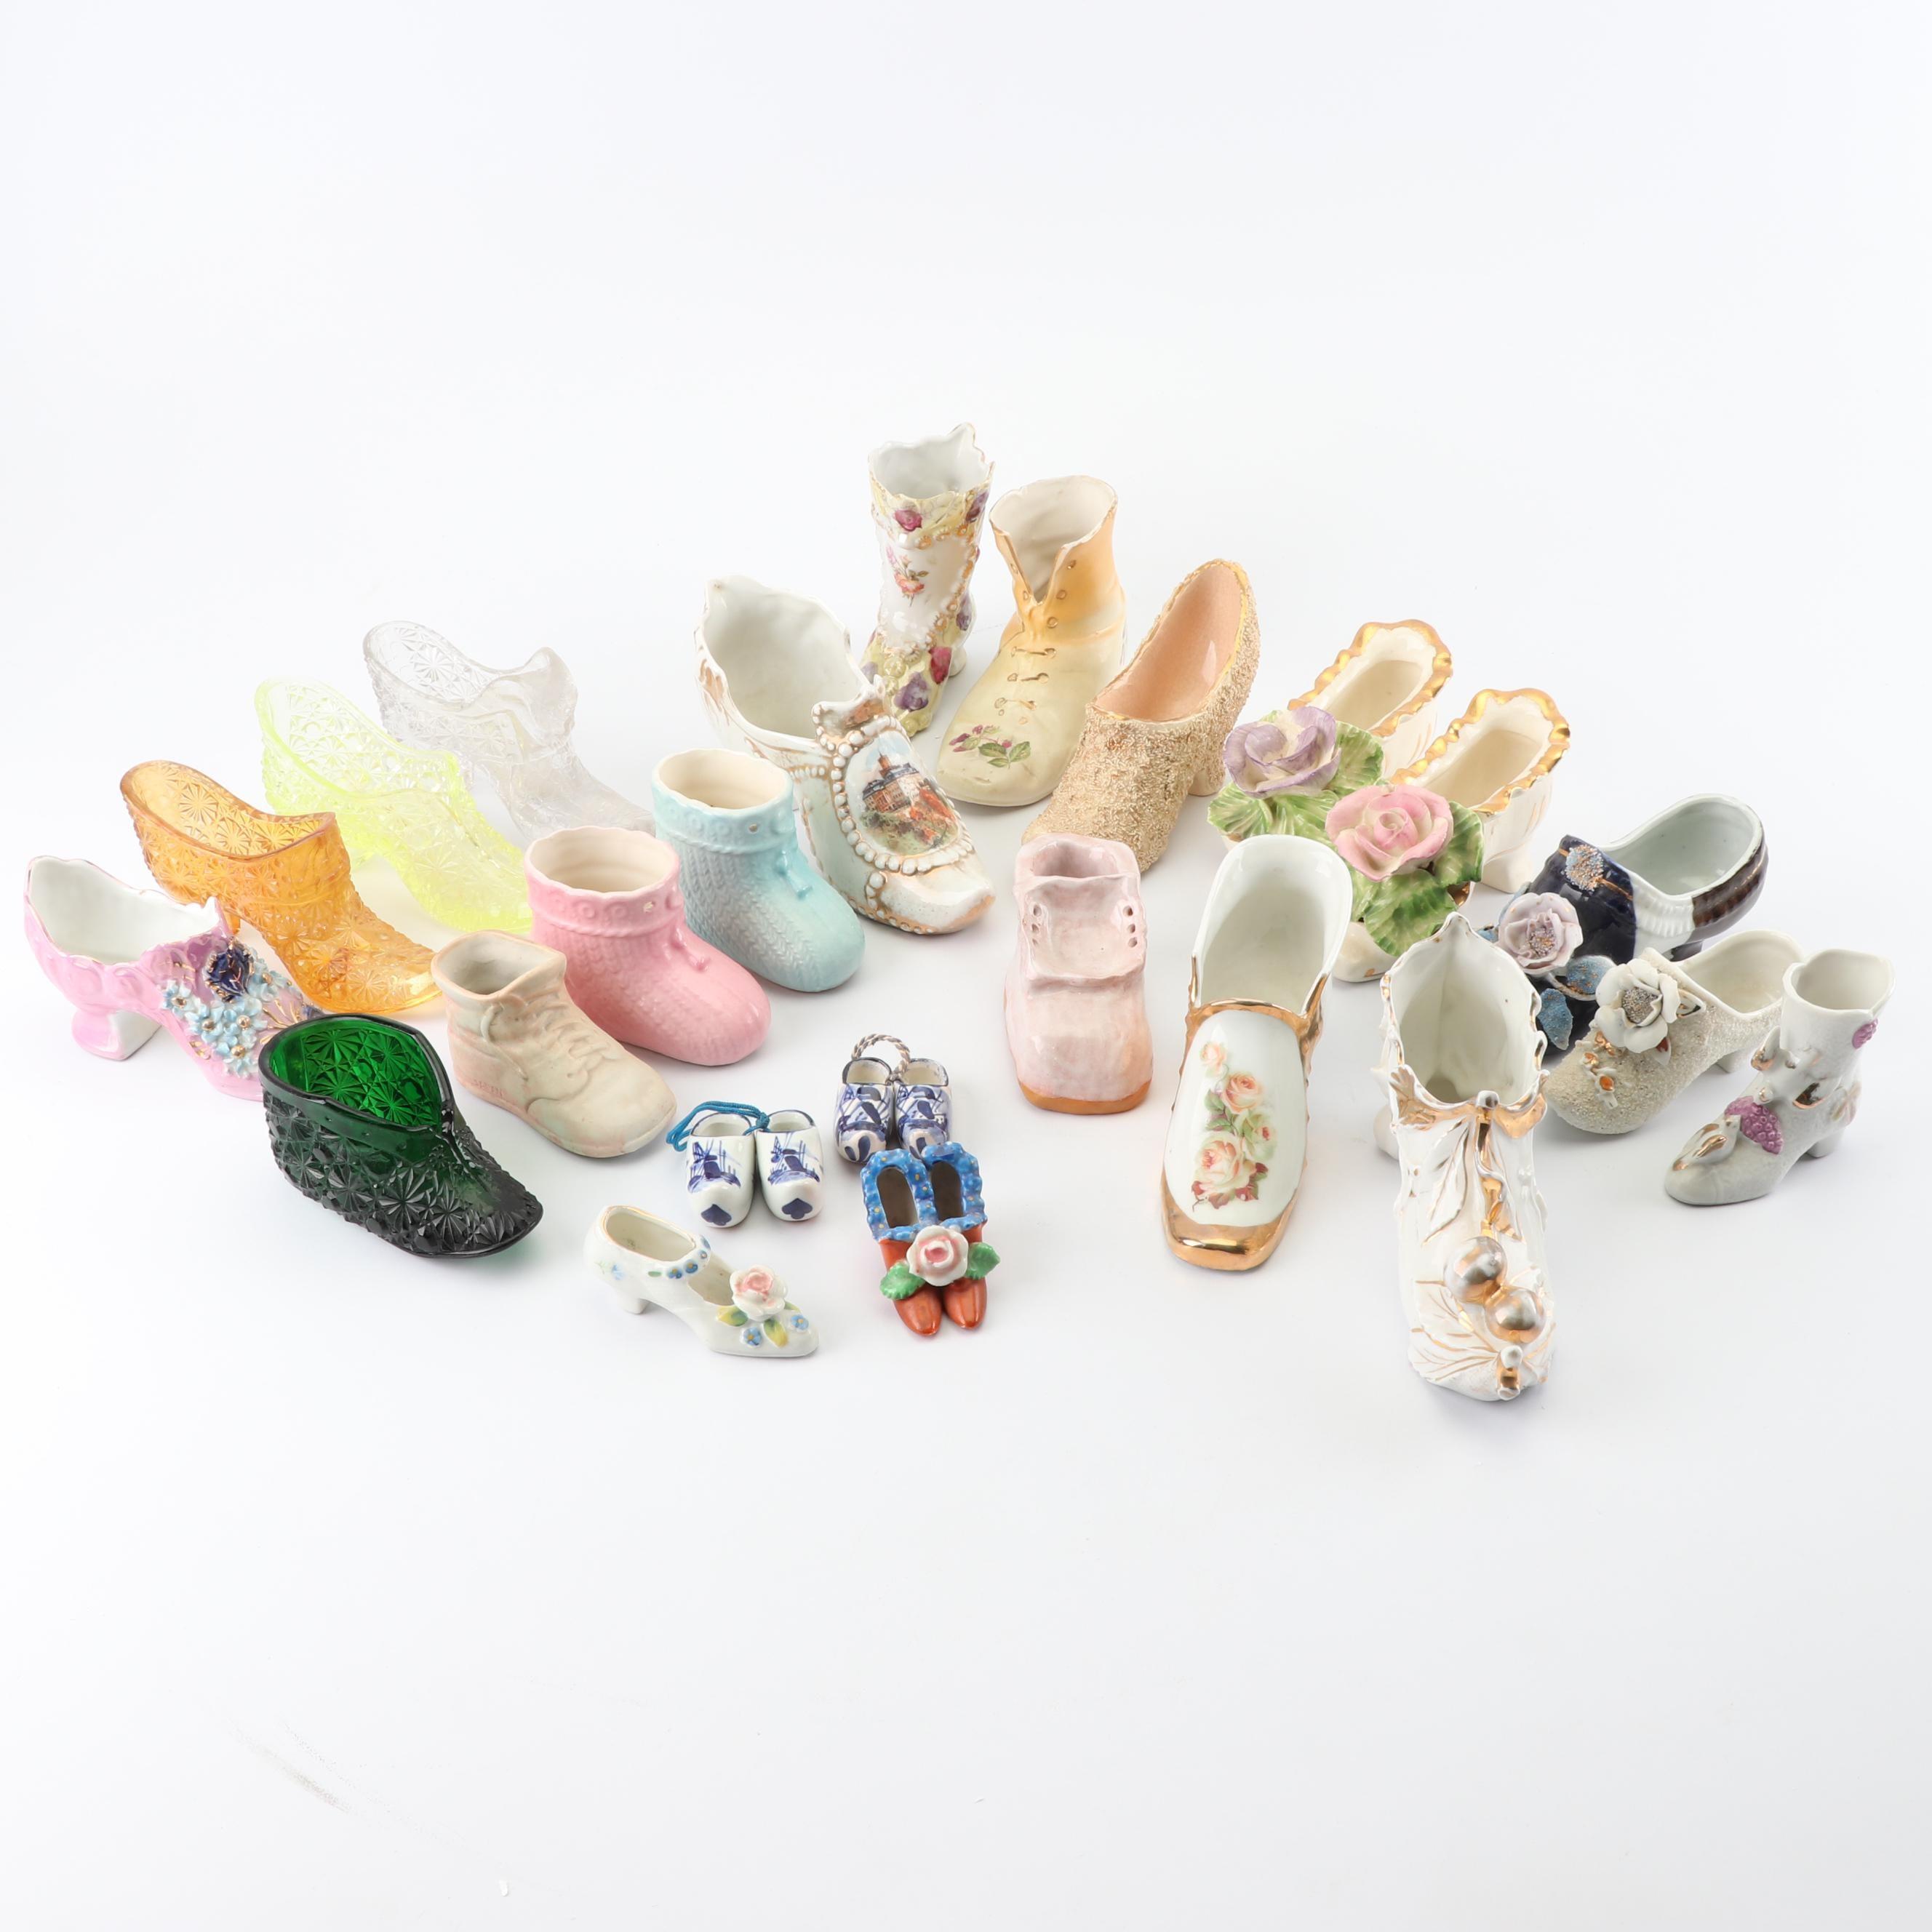 Vintage Decorative Miniature Shoe Figurines